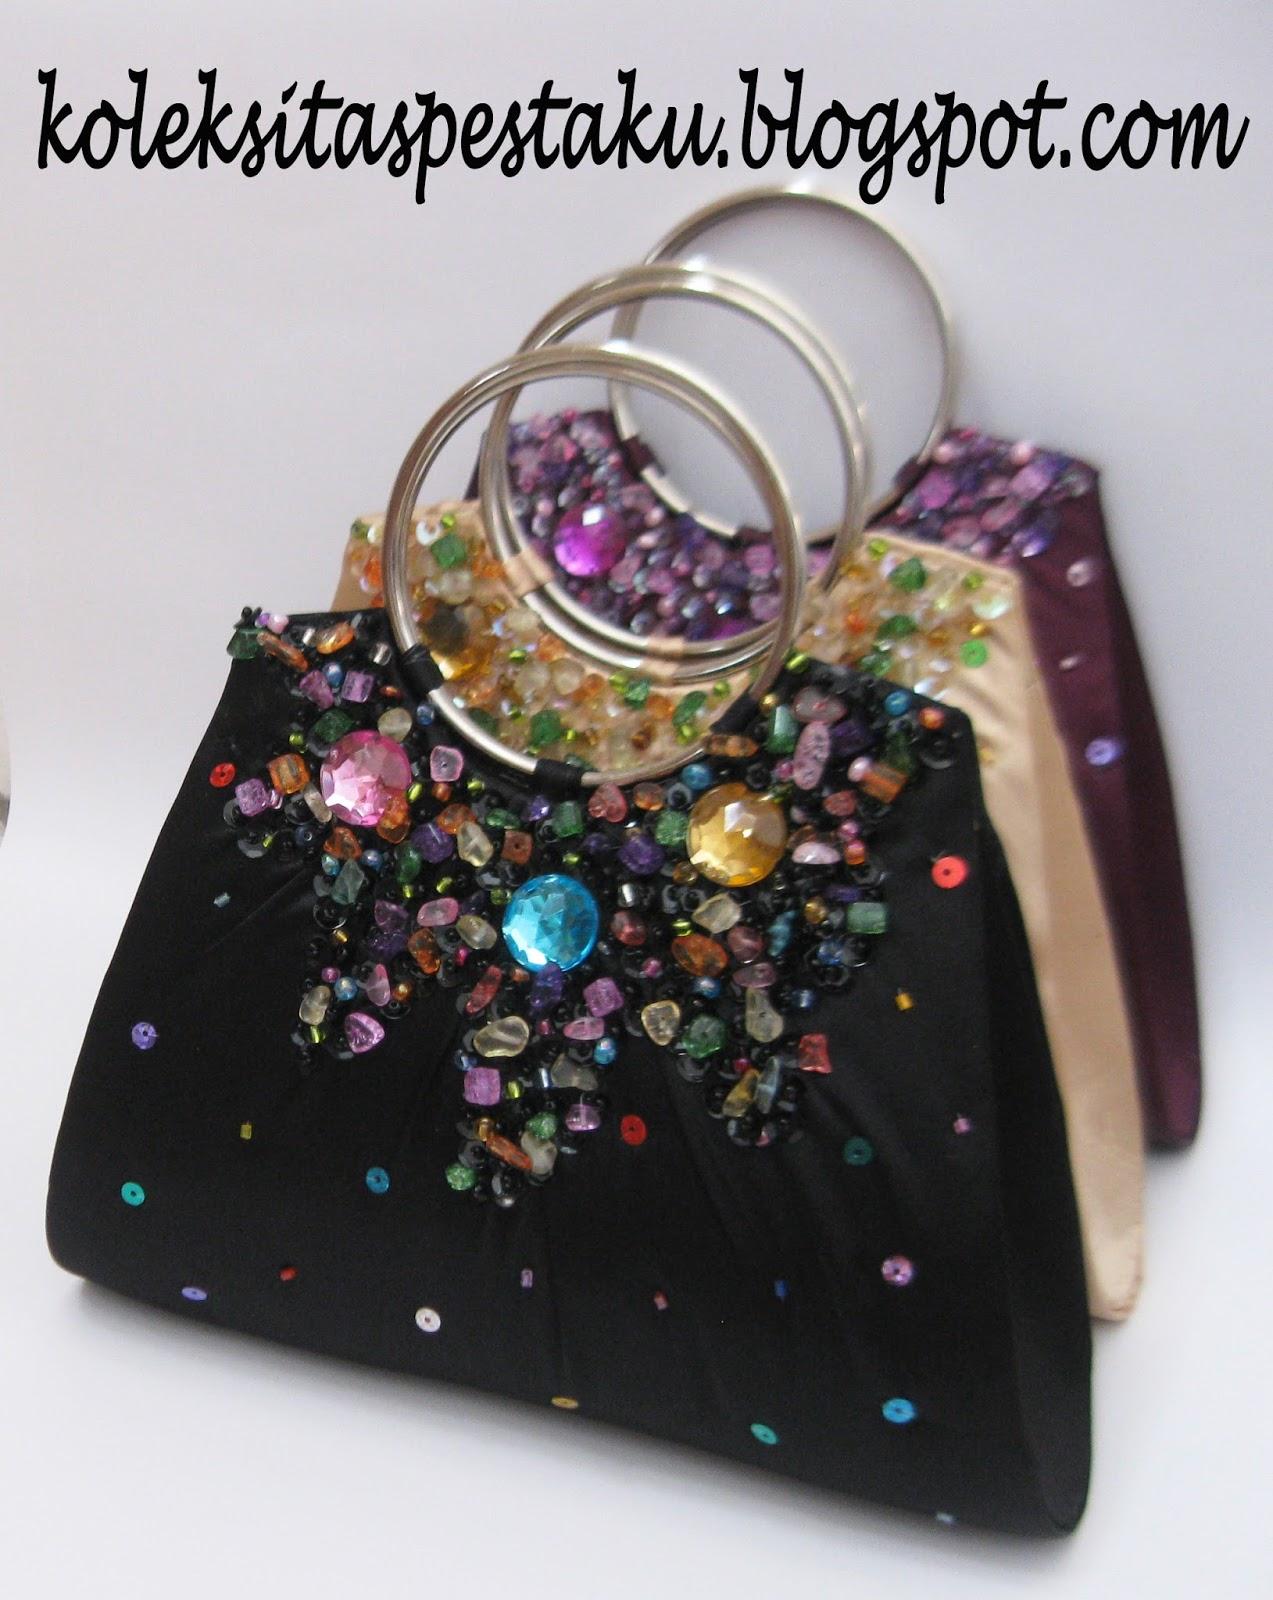 Model Terbaru Agustus Tas Pesta Cantik dan Elegant. TAS PESTA - CLUTCH BAG  ... 3bbb4a0a92